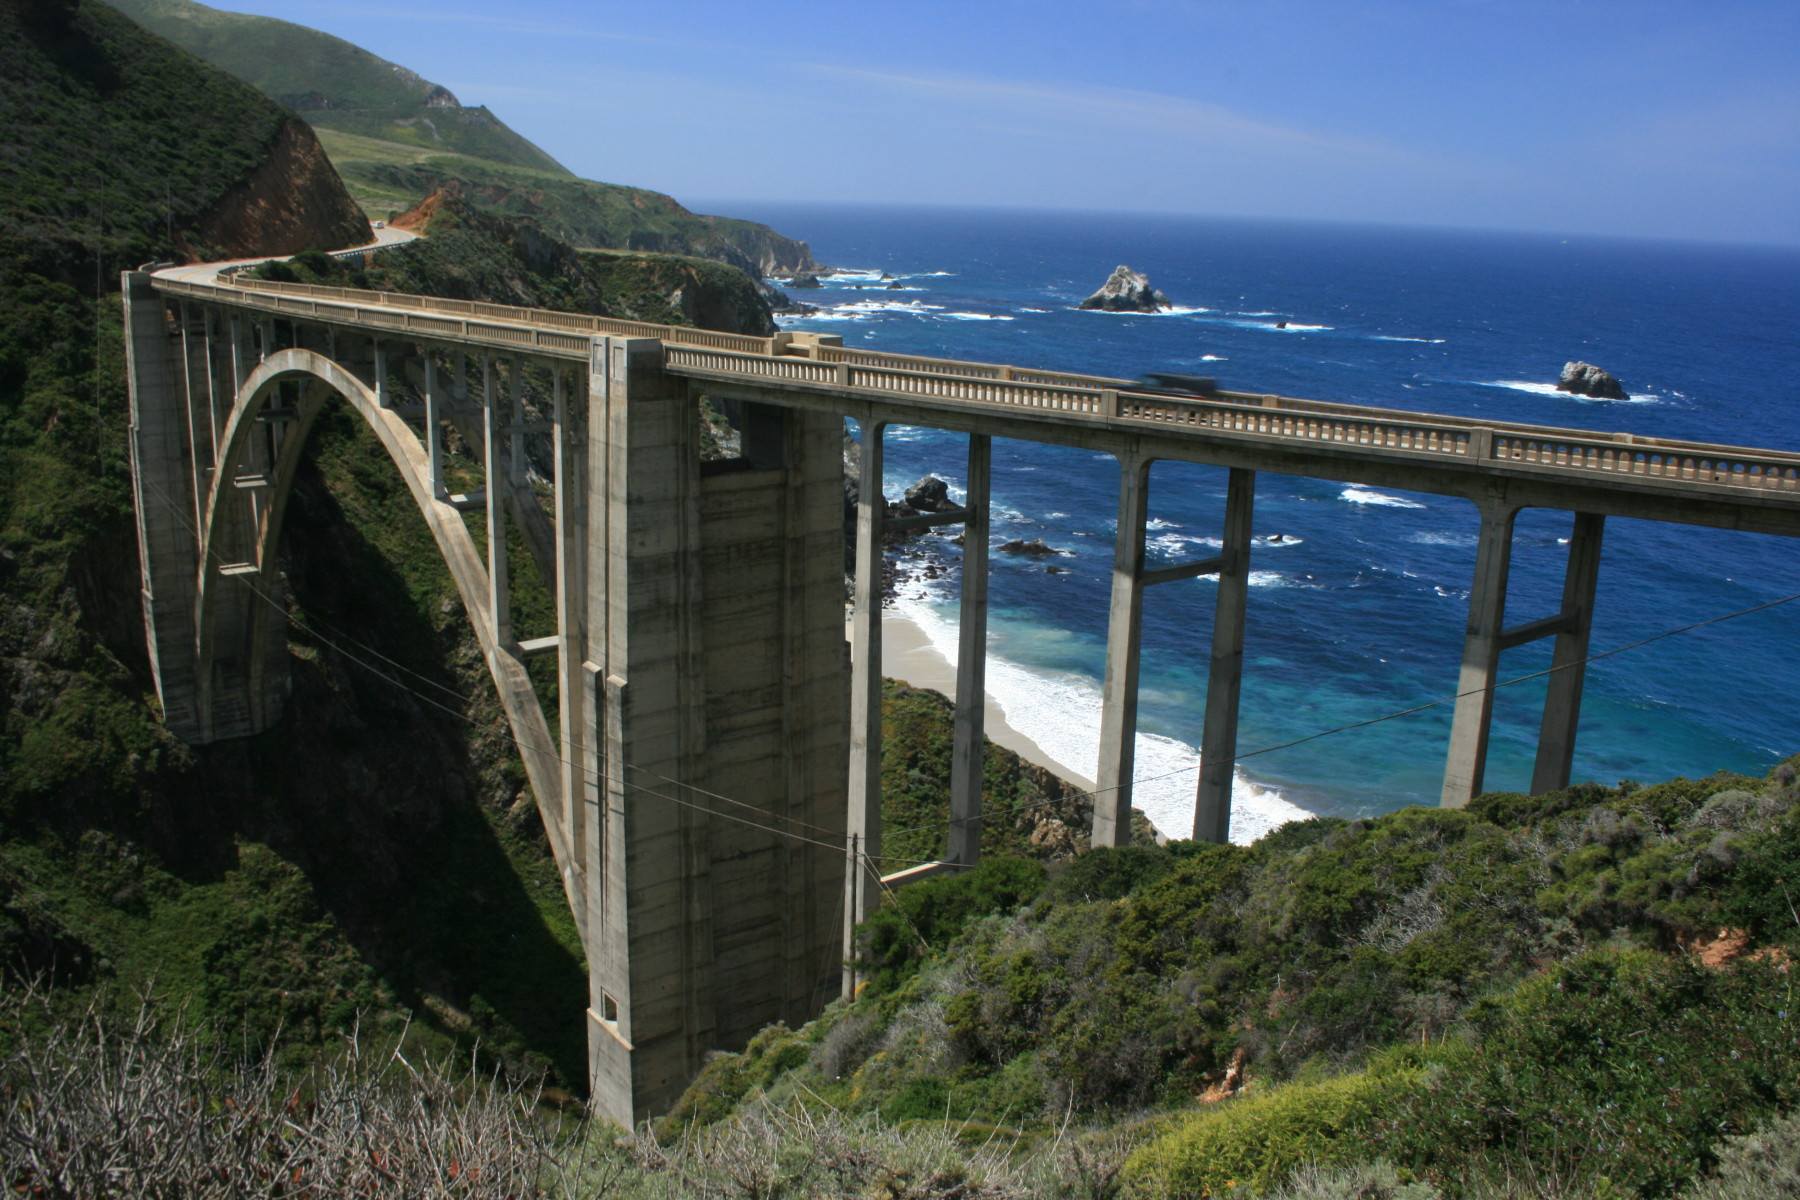 Bixby_Creek_Bridge,_The_Big_Sur,_California